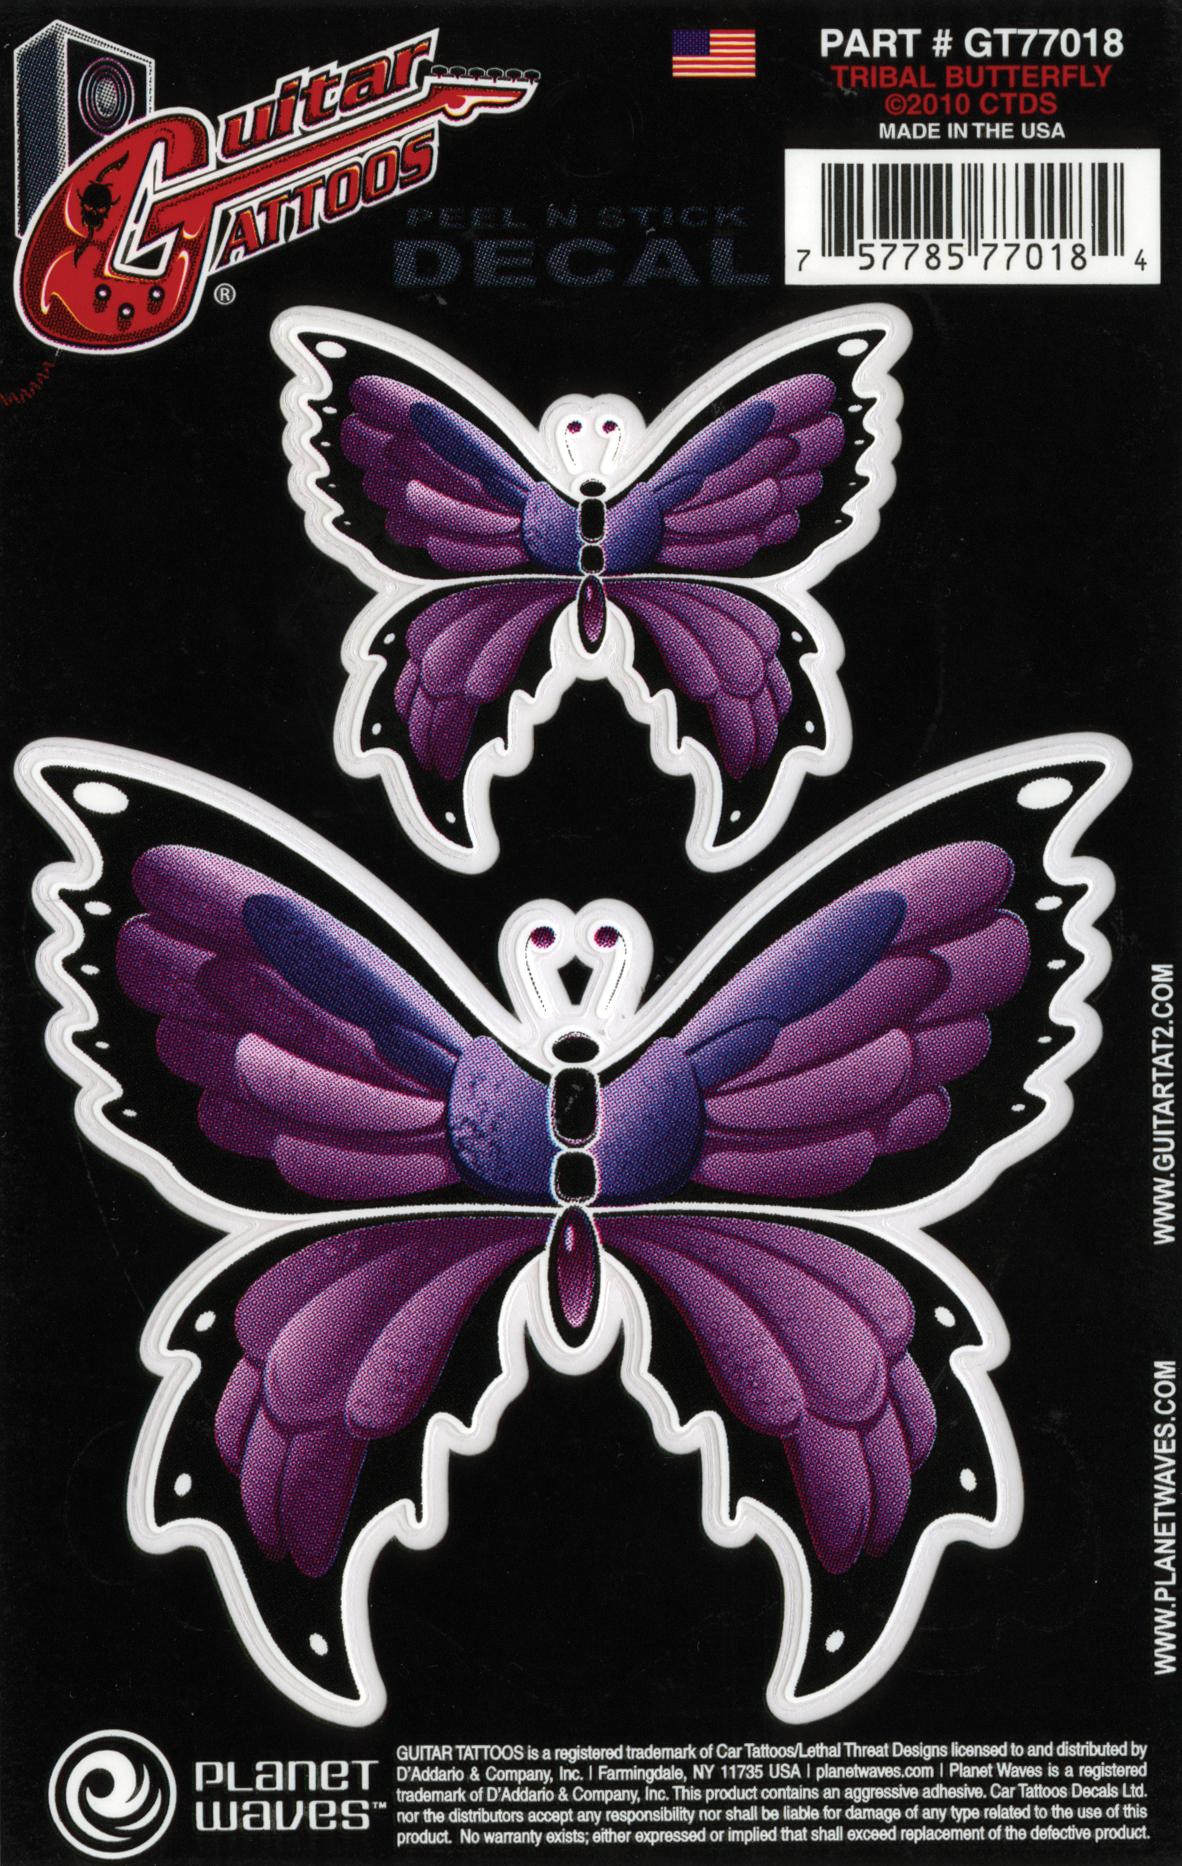 D'Addario Guitar Tattoo Tribal Butterfly